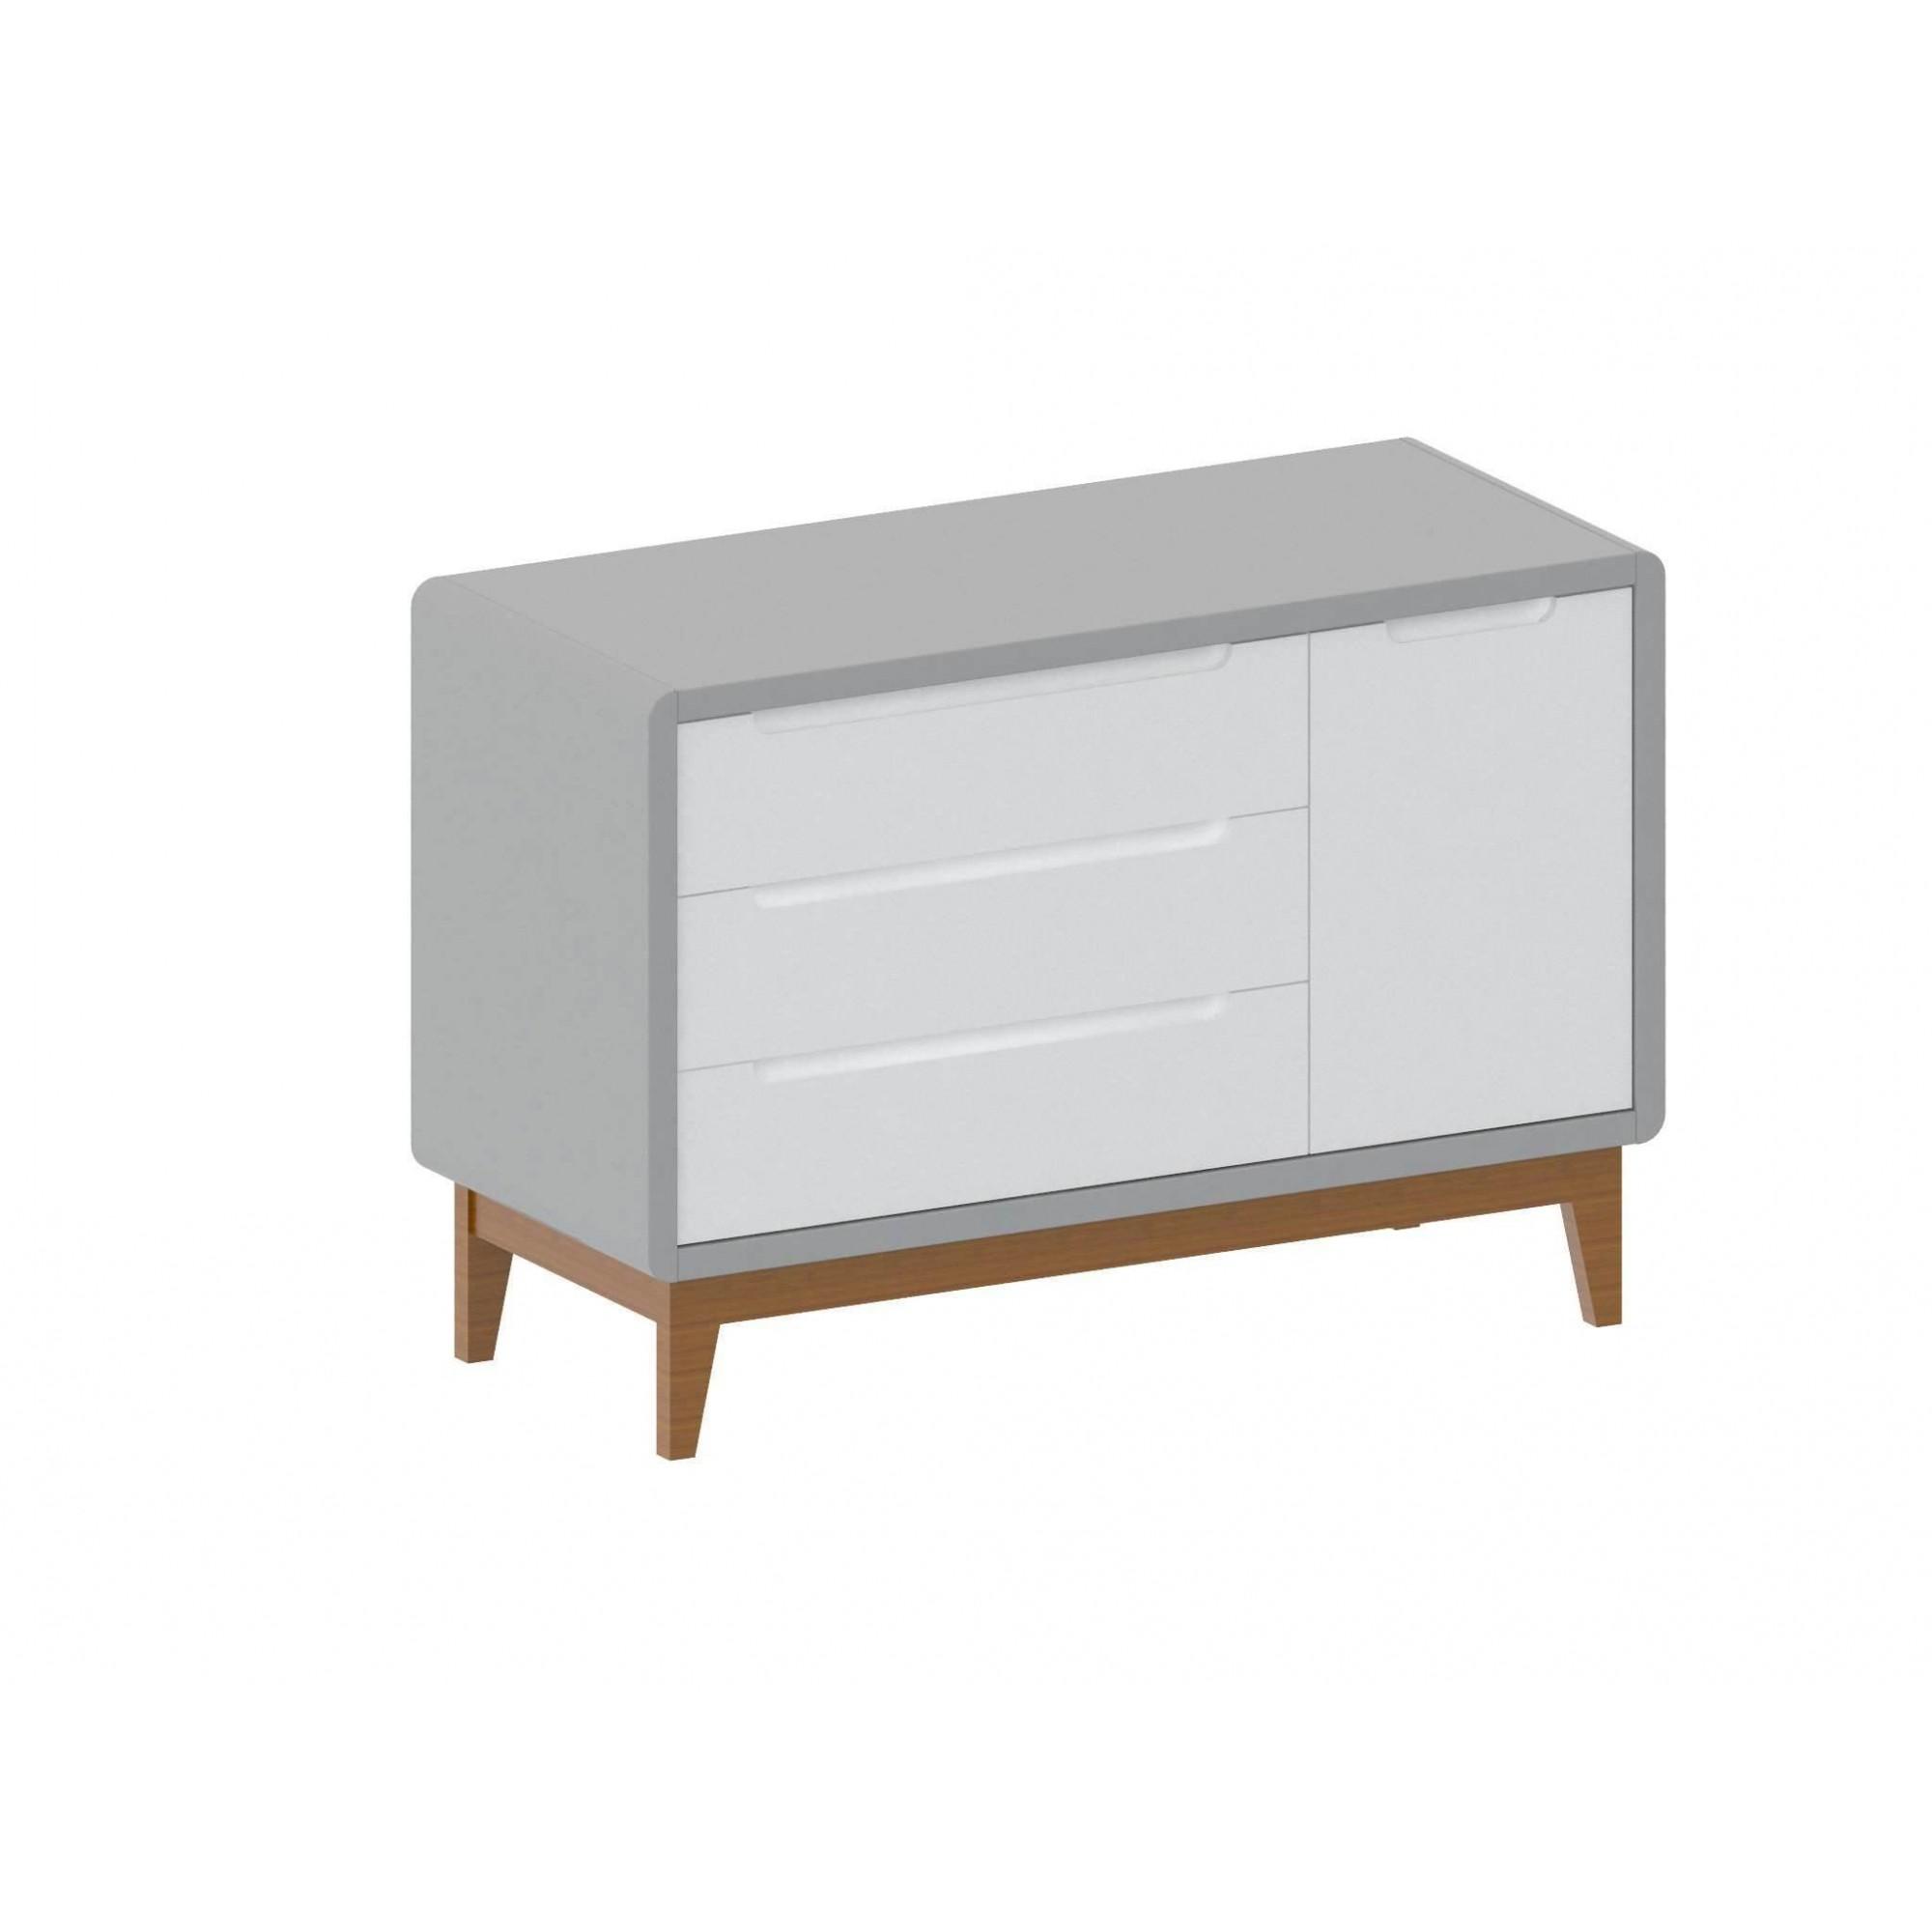 Kit Berço + Cômoda Bo 3 gavetas e porta lateral Branco com cinza